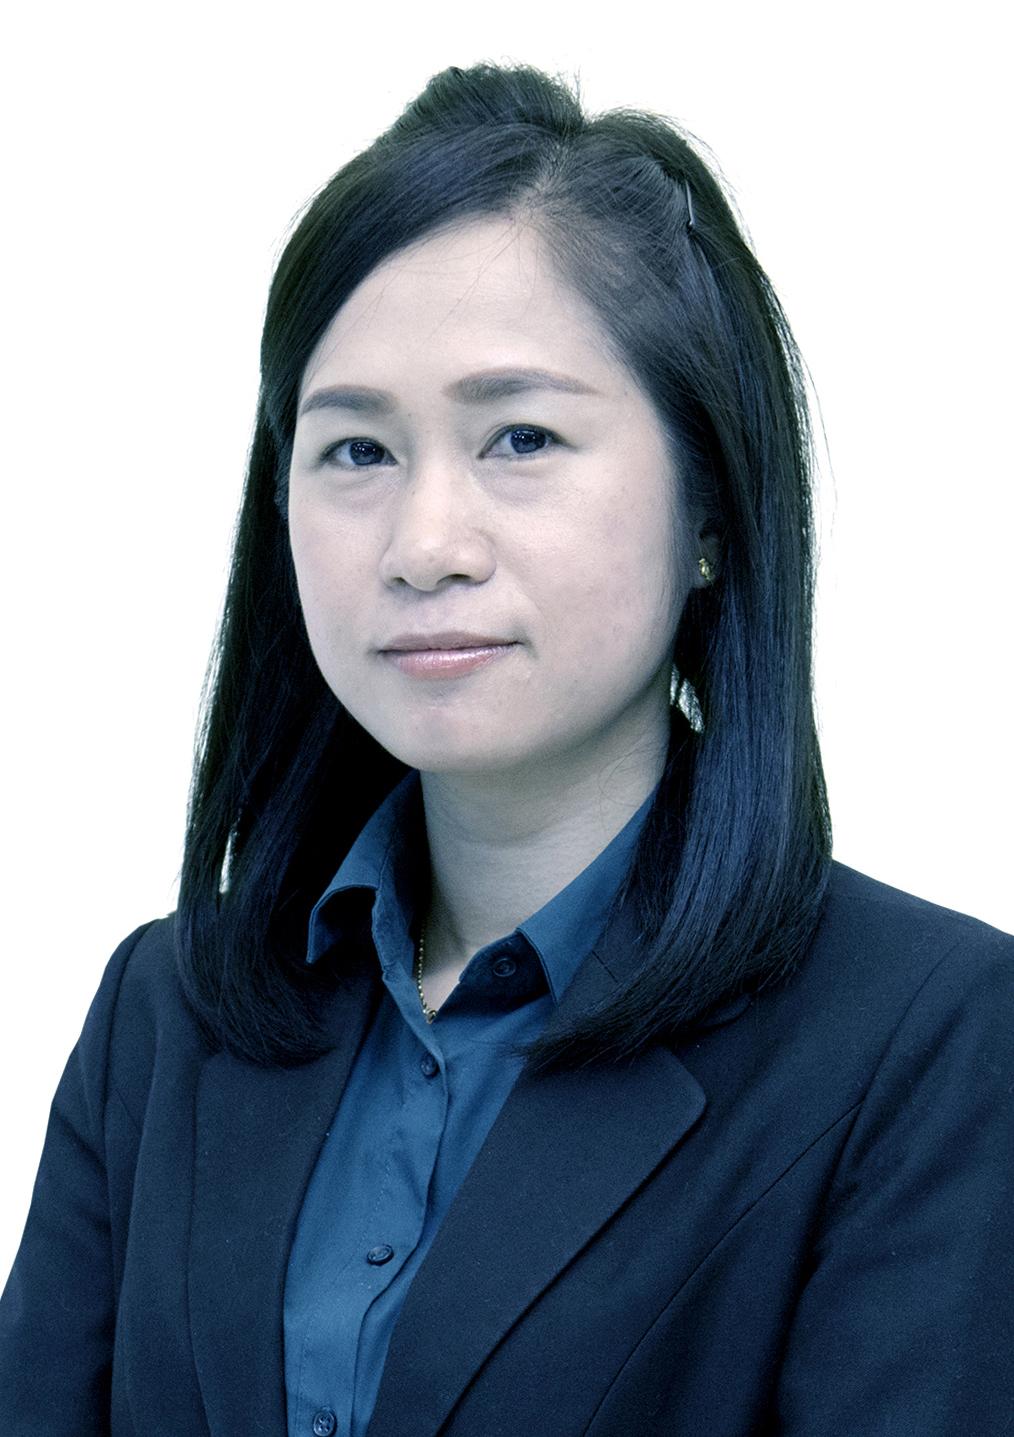 MS  SOUPHAPHONE KHAMSENNAM - LNCCI - Lao National Chamber of